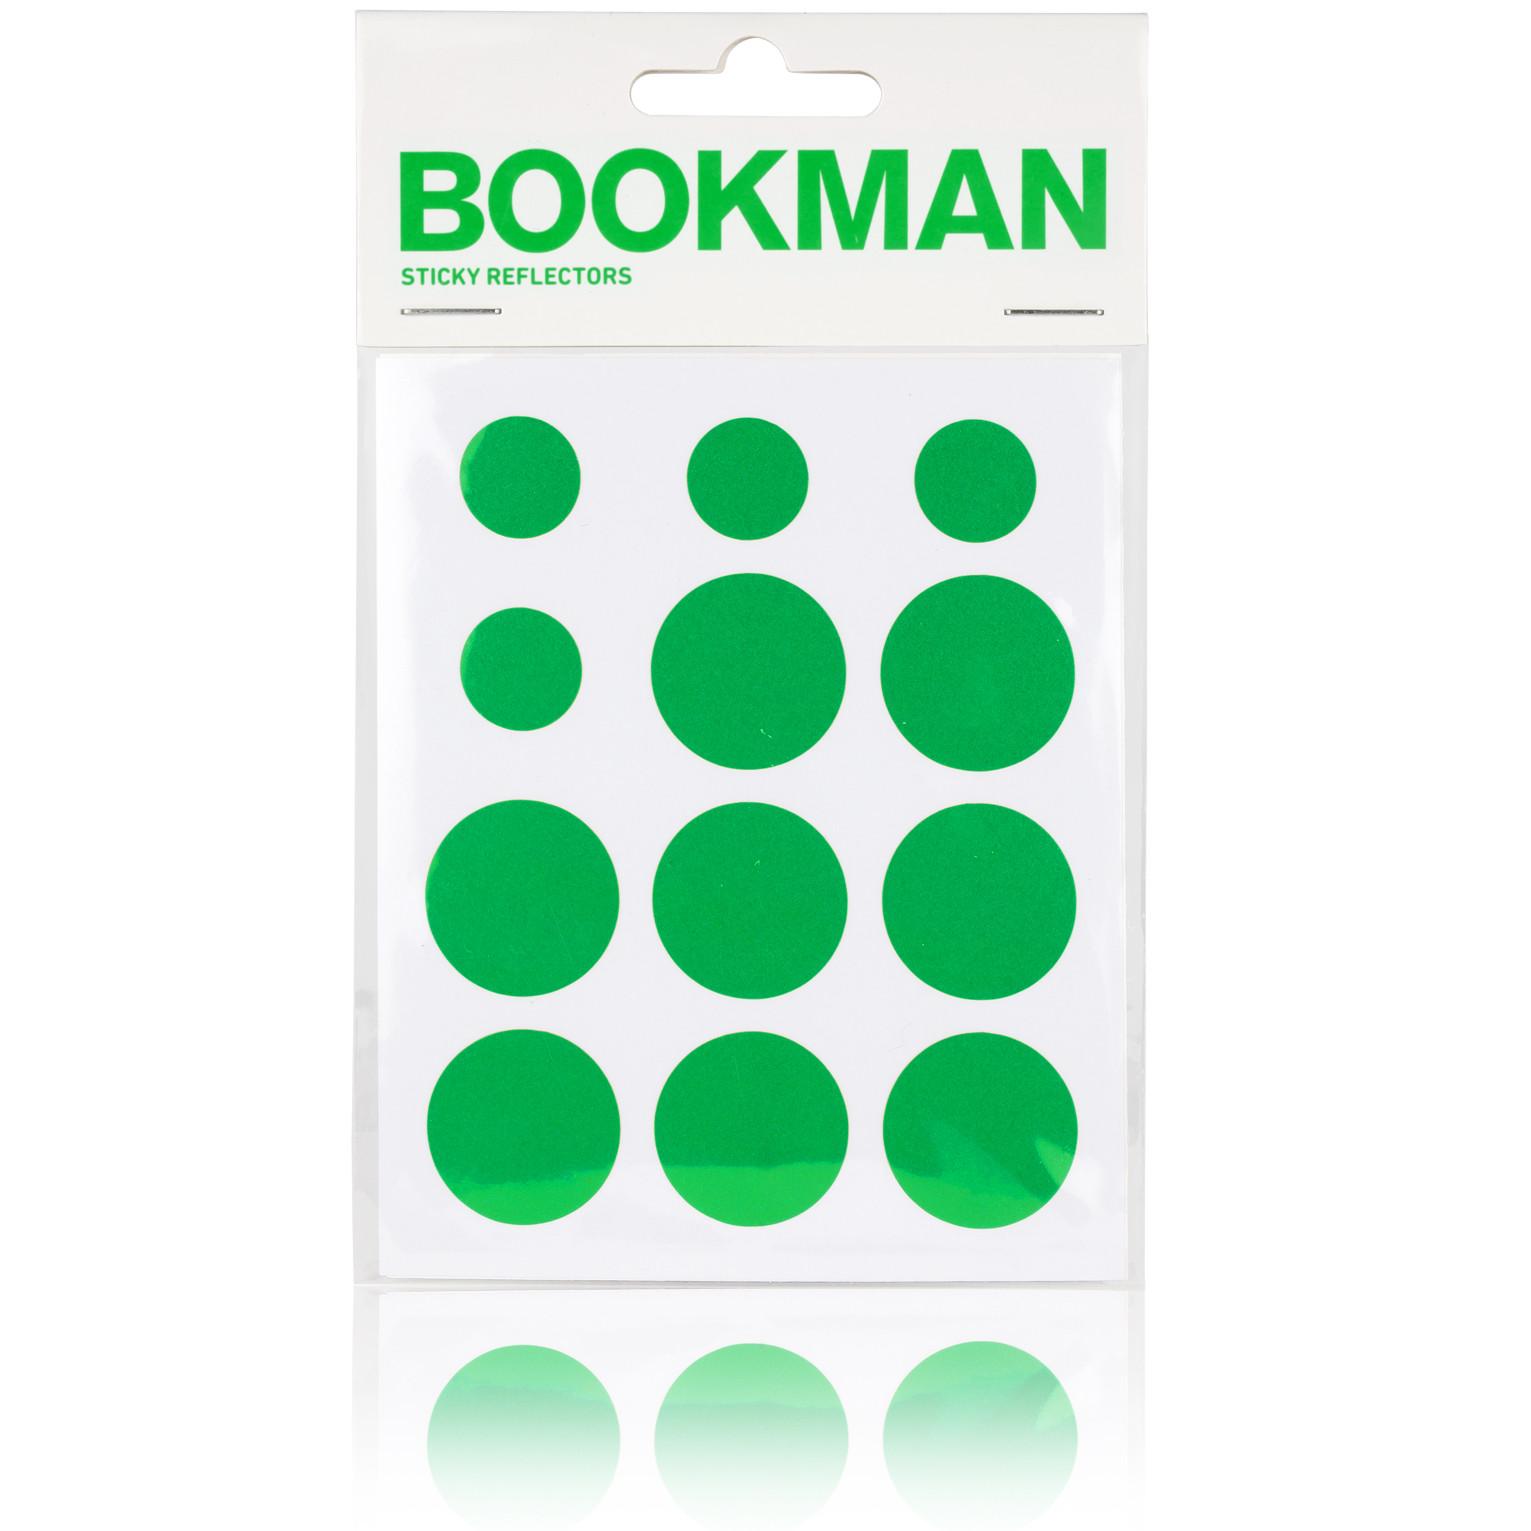 Bookman Stricky Reflectors grønne refleksklistermærker | Reflectives